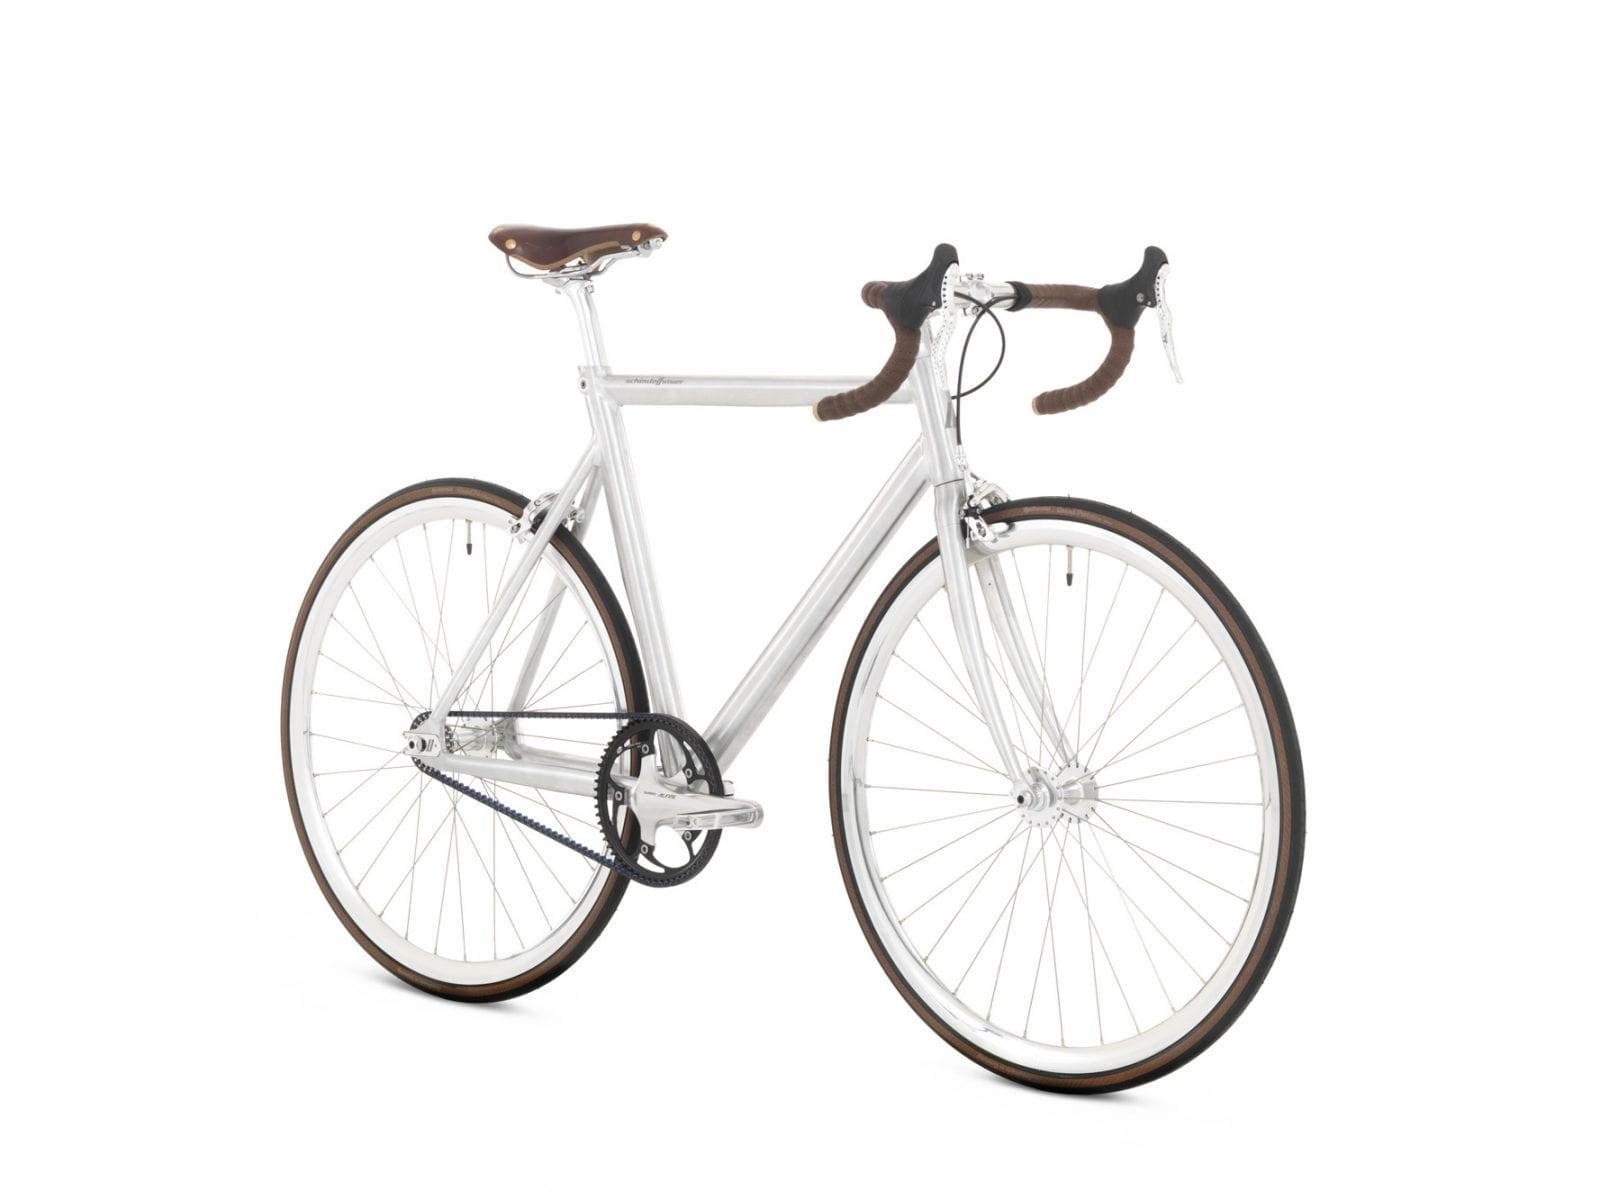 Siegfried_Road_2019_packshot_ap_Tienda_De_Bicicletas_Vuk_Bikes_Madrid